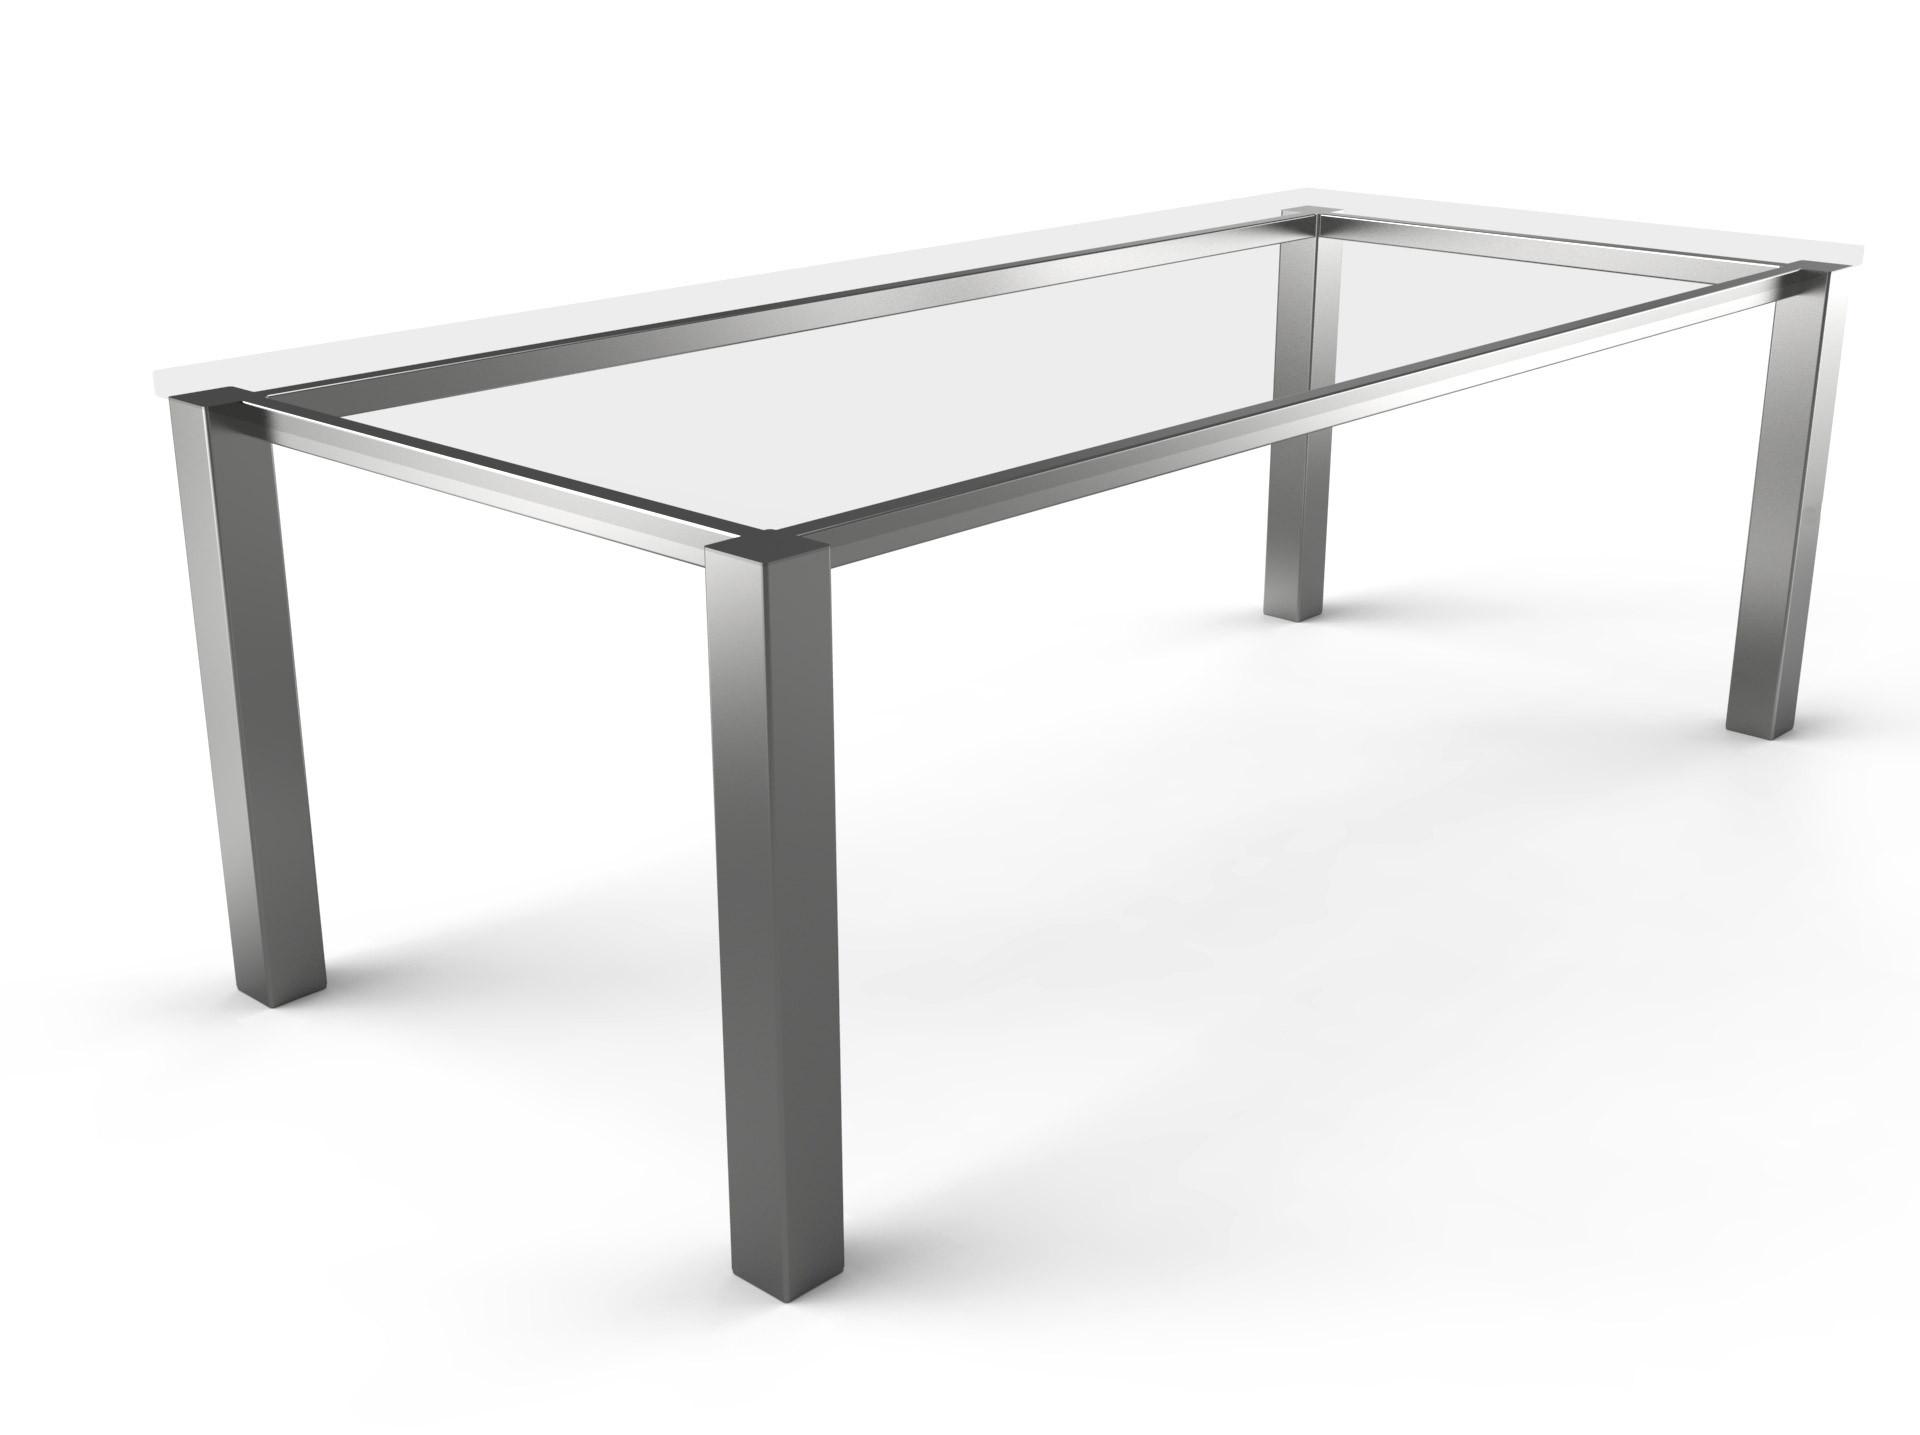 Tischgestell Standard Edelstahl